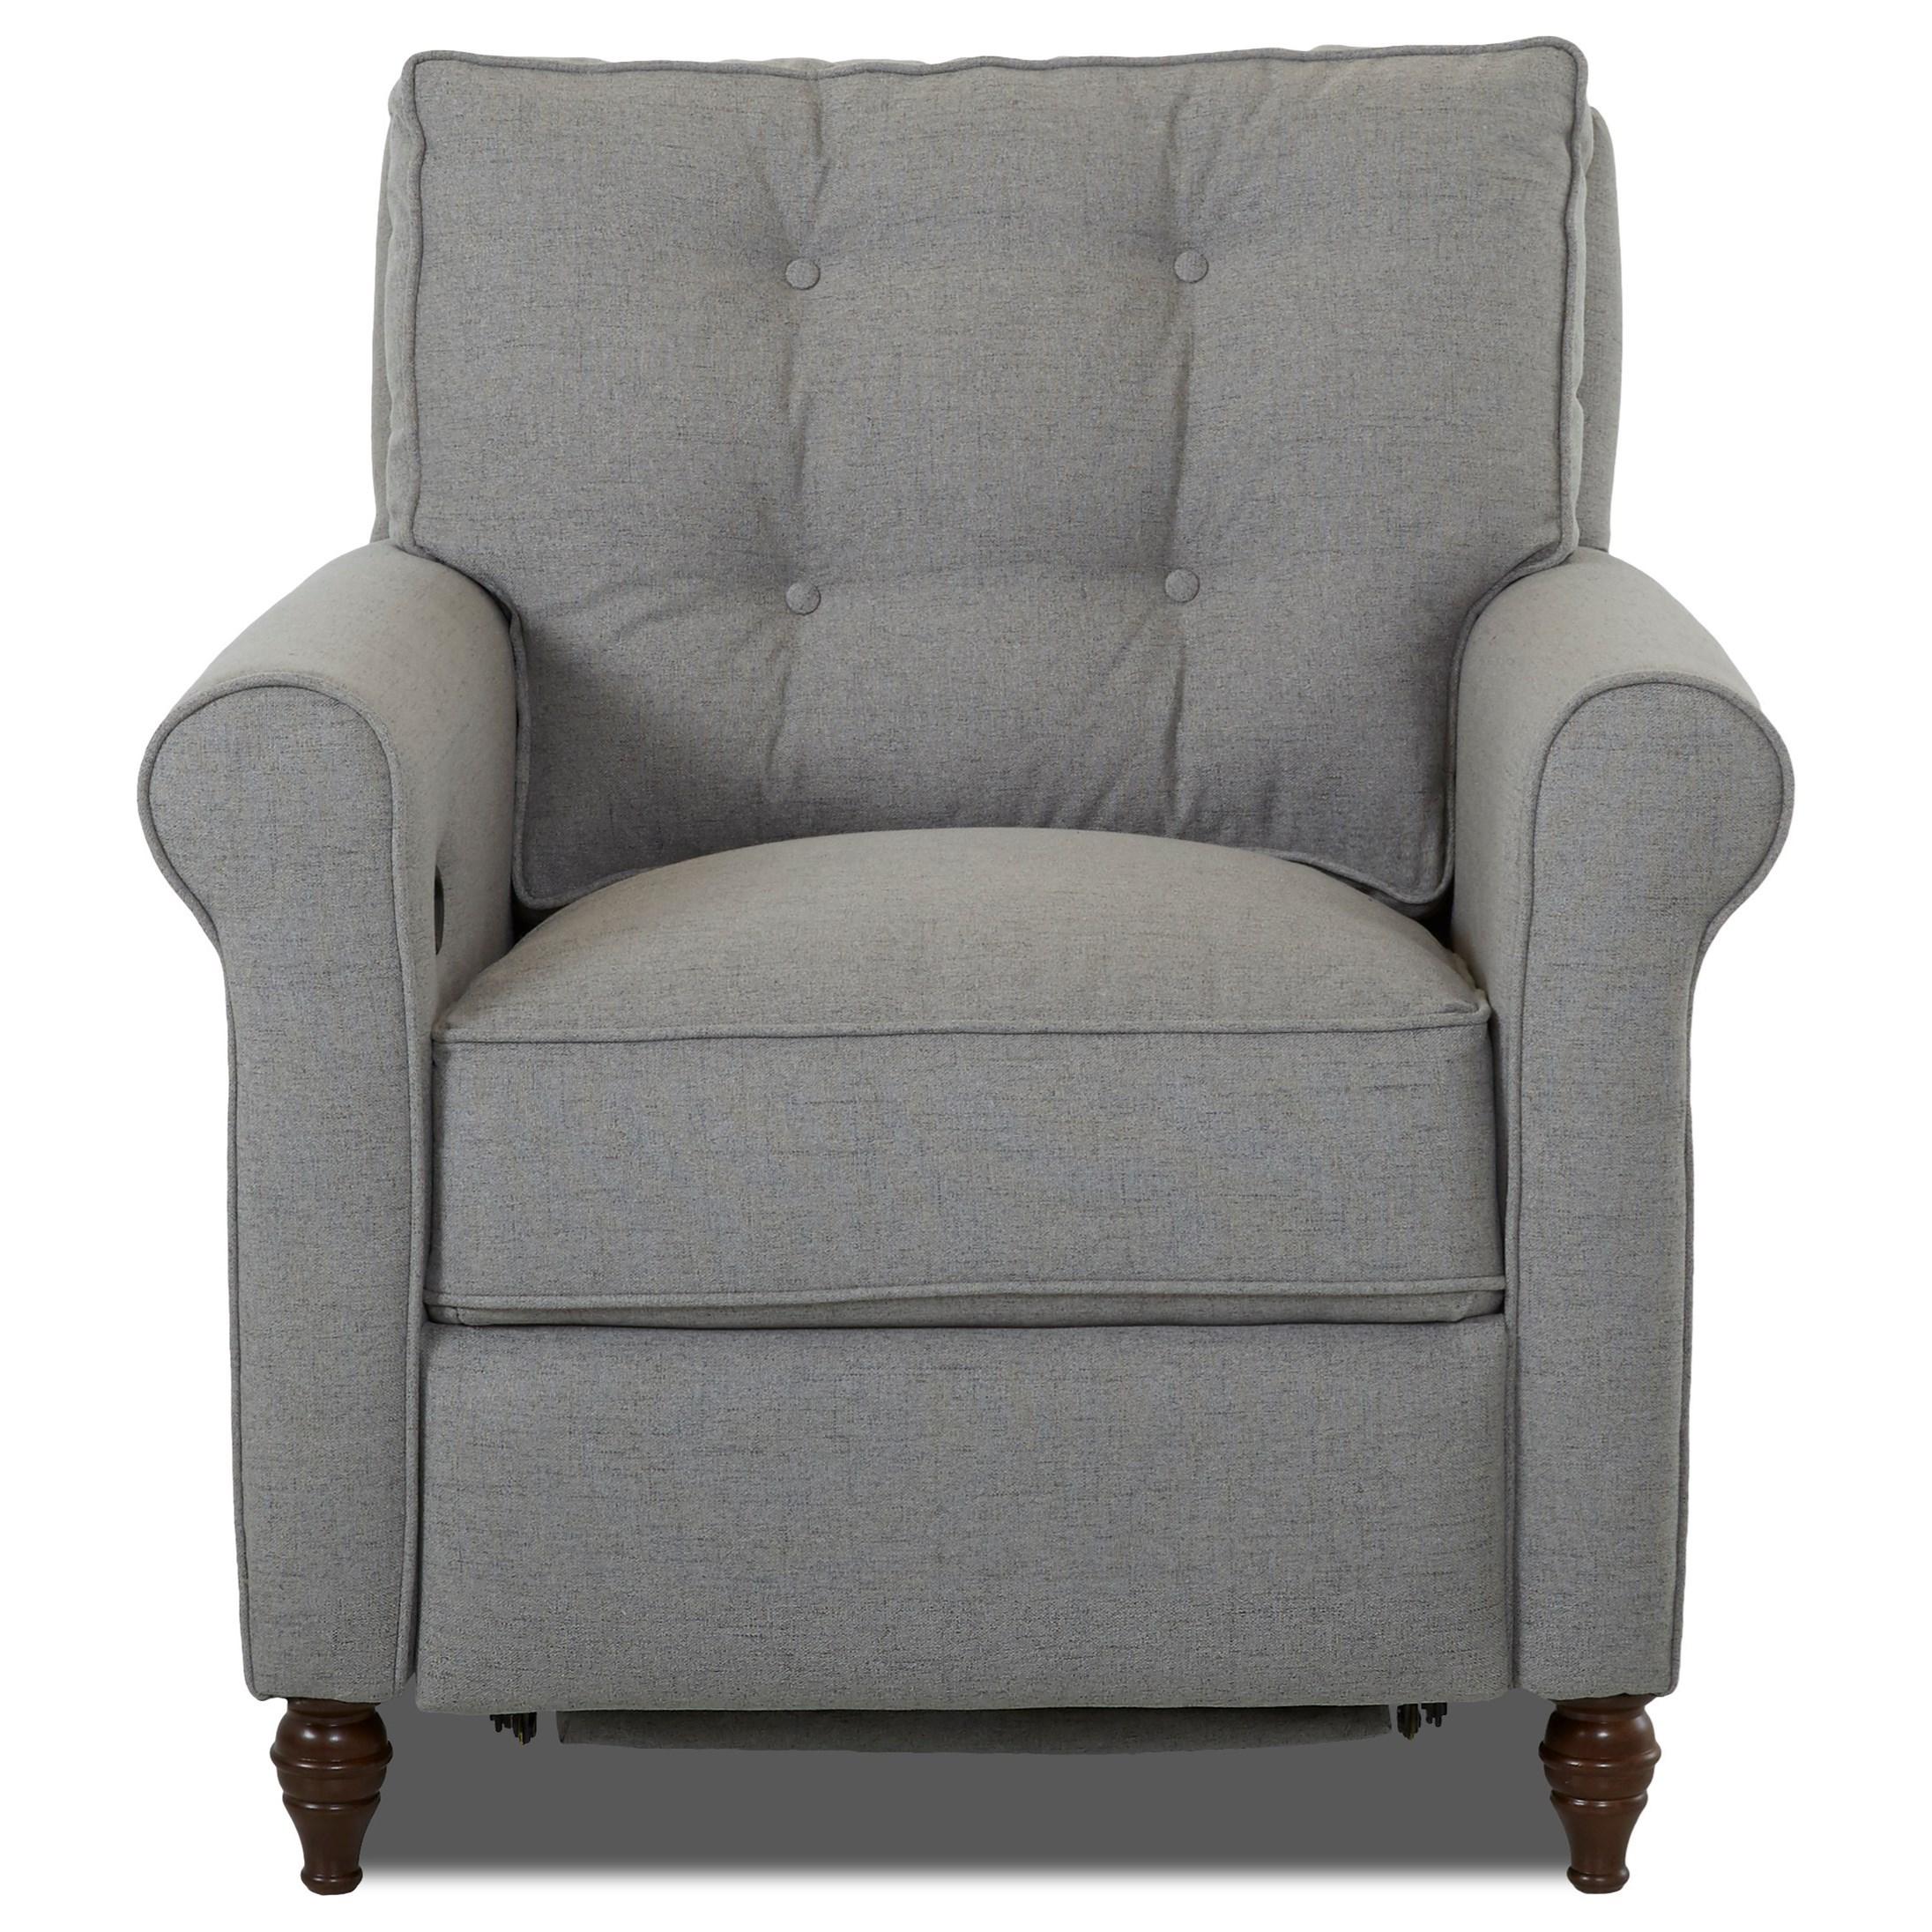 Klaussner HollandPower Hybrid Chair ...